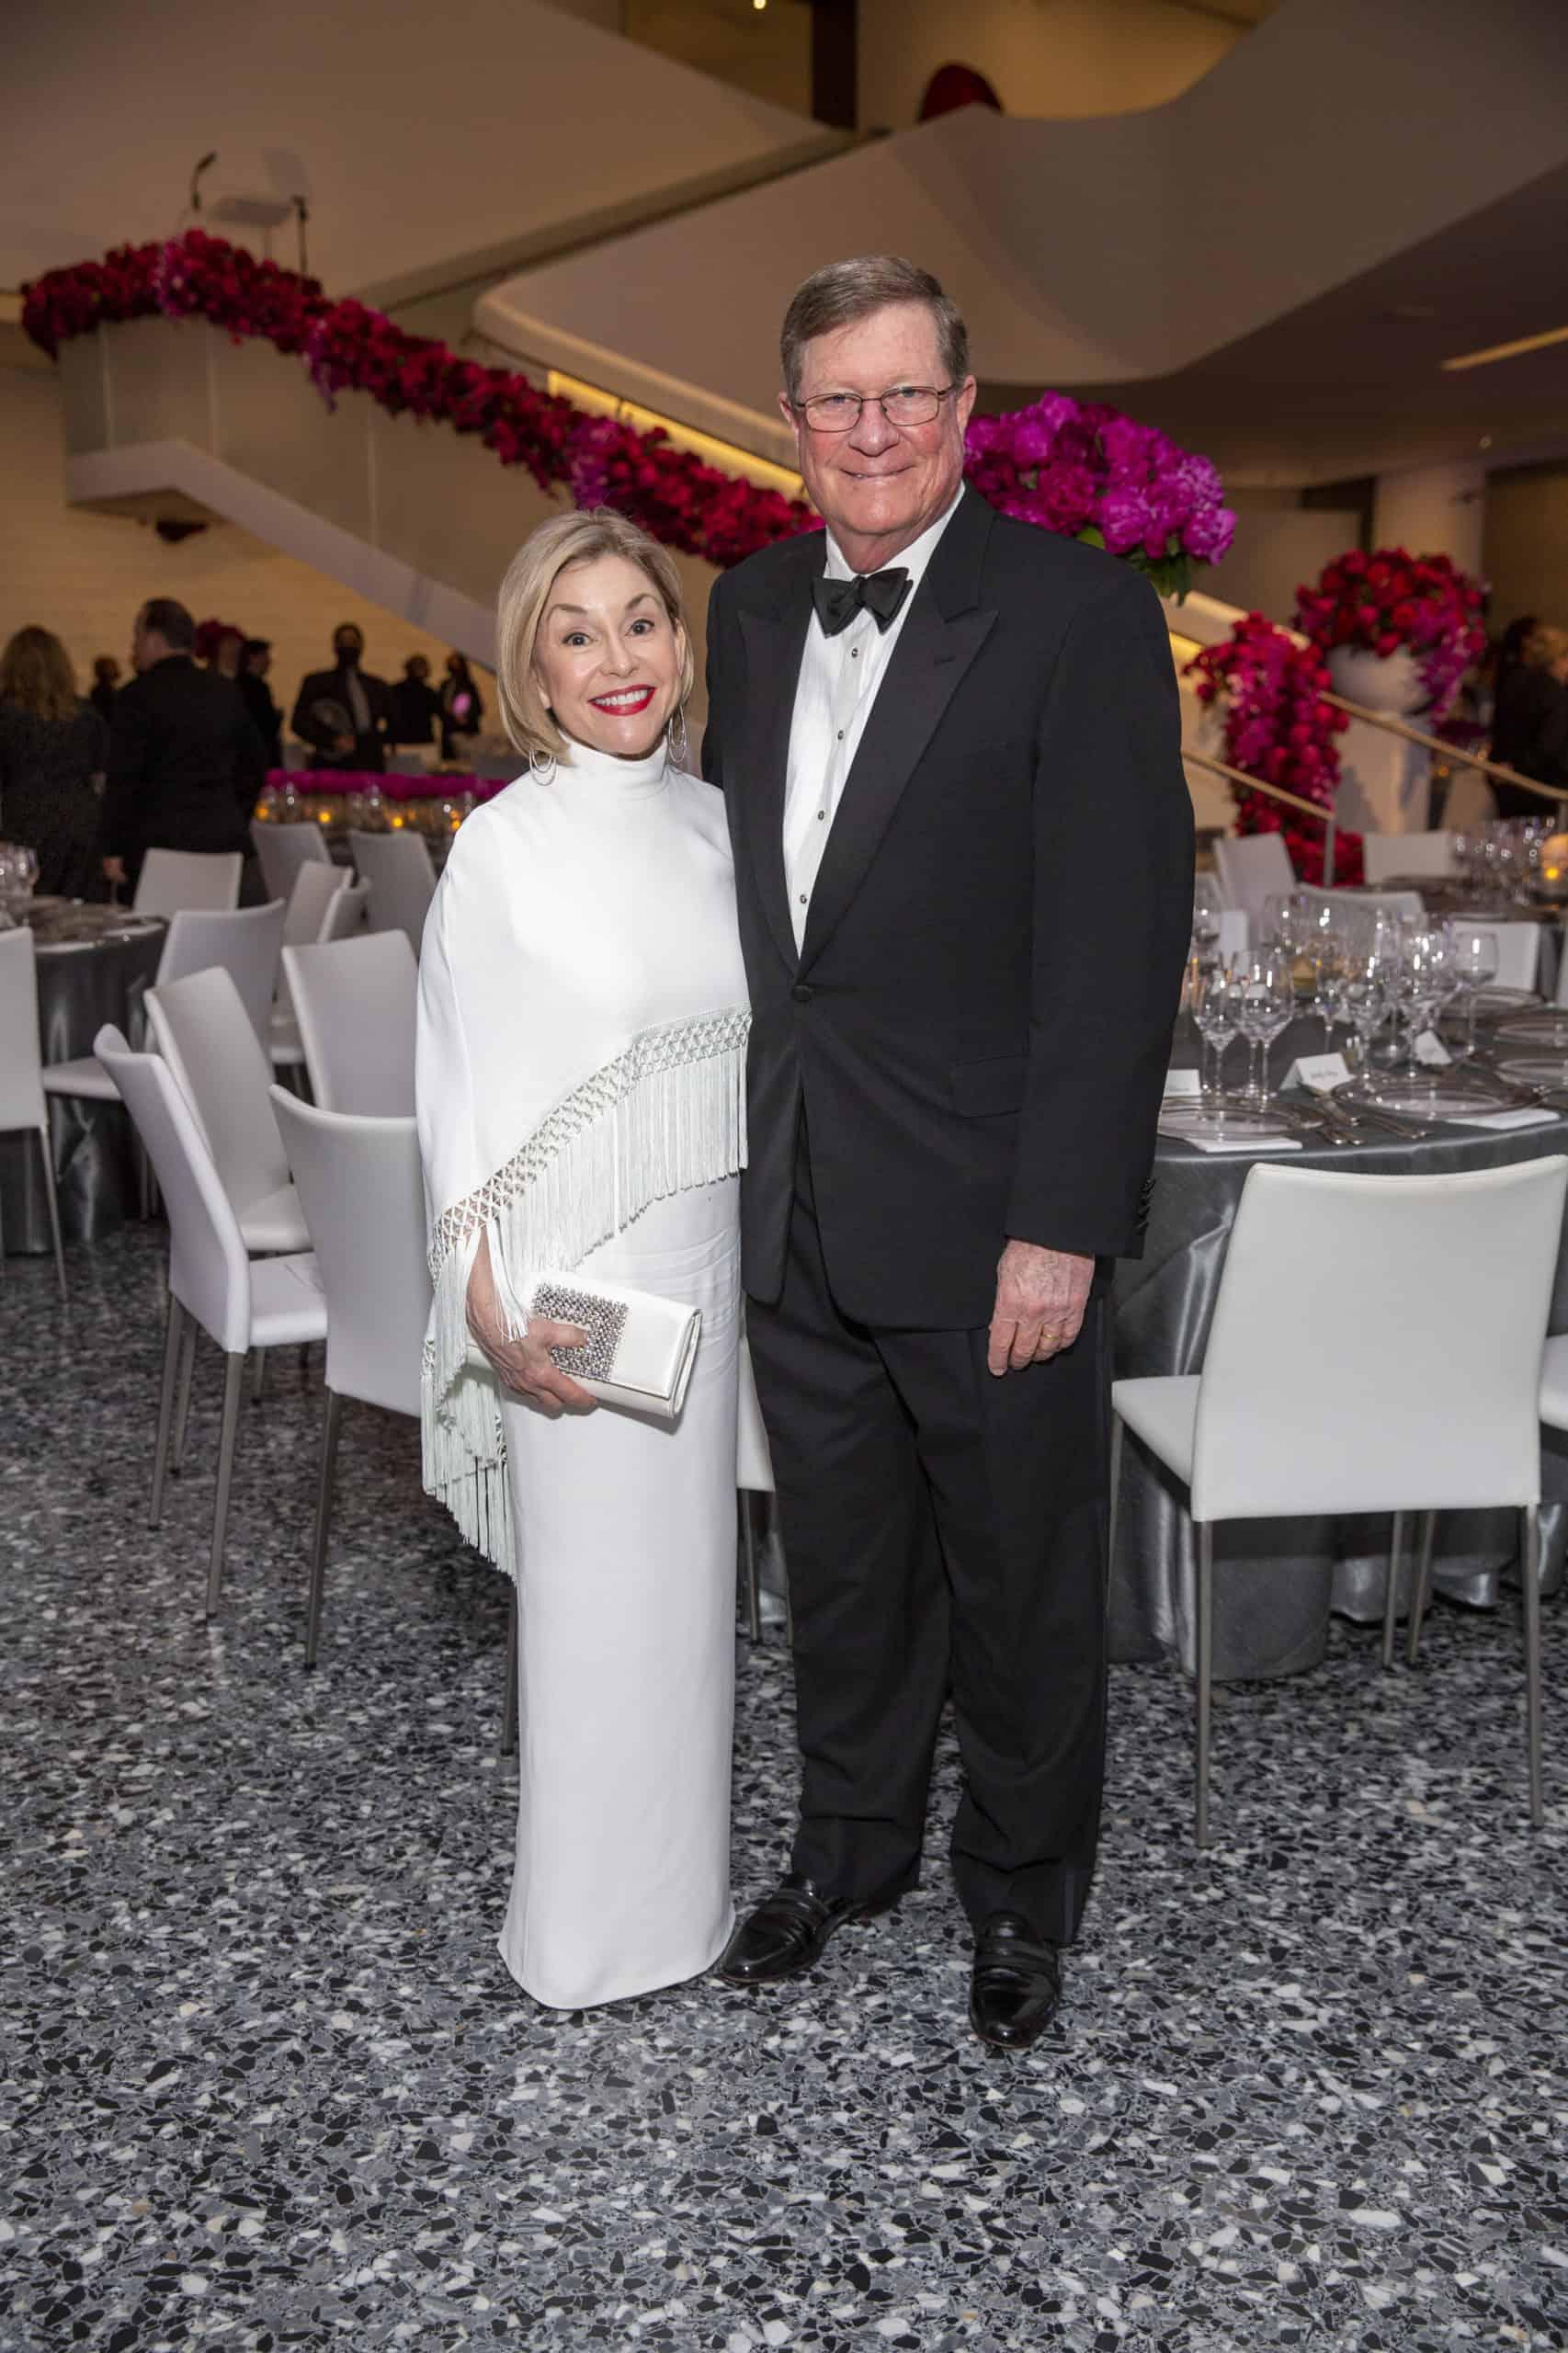 Sharyn and Jim Weaver